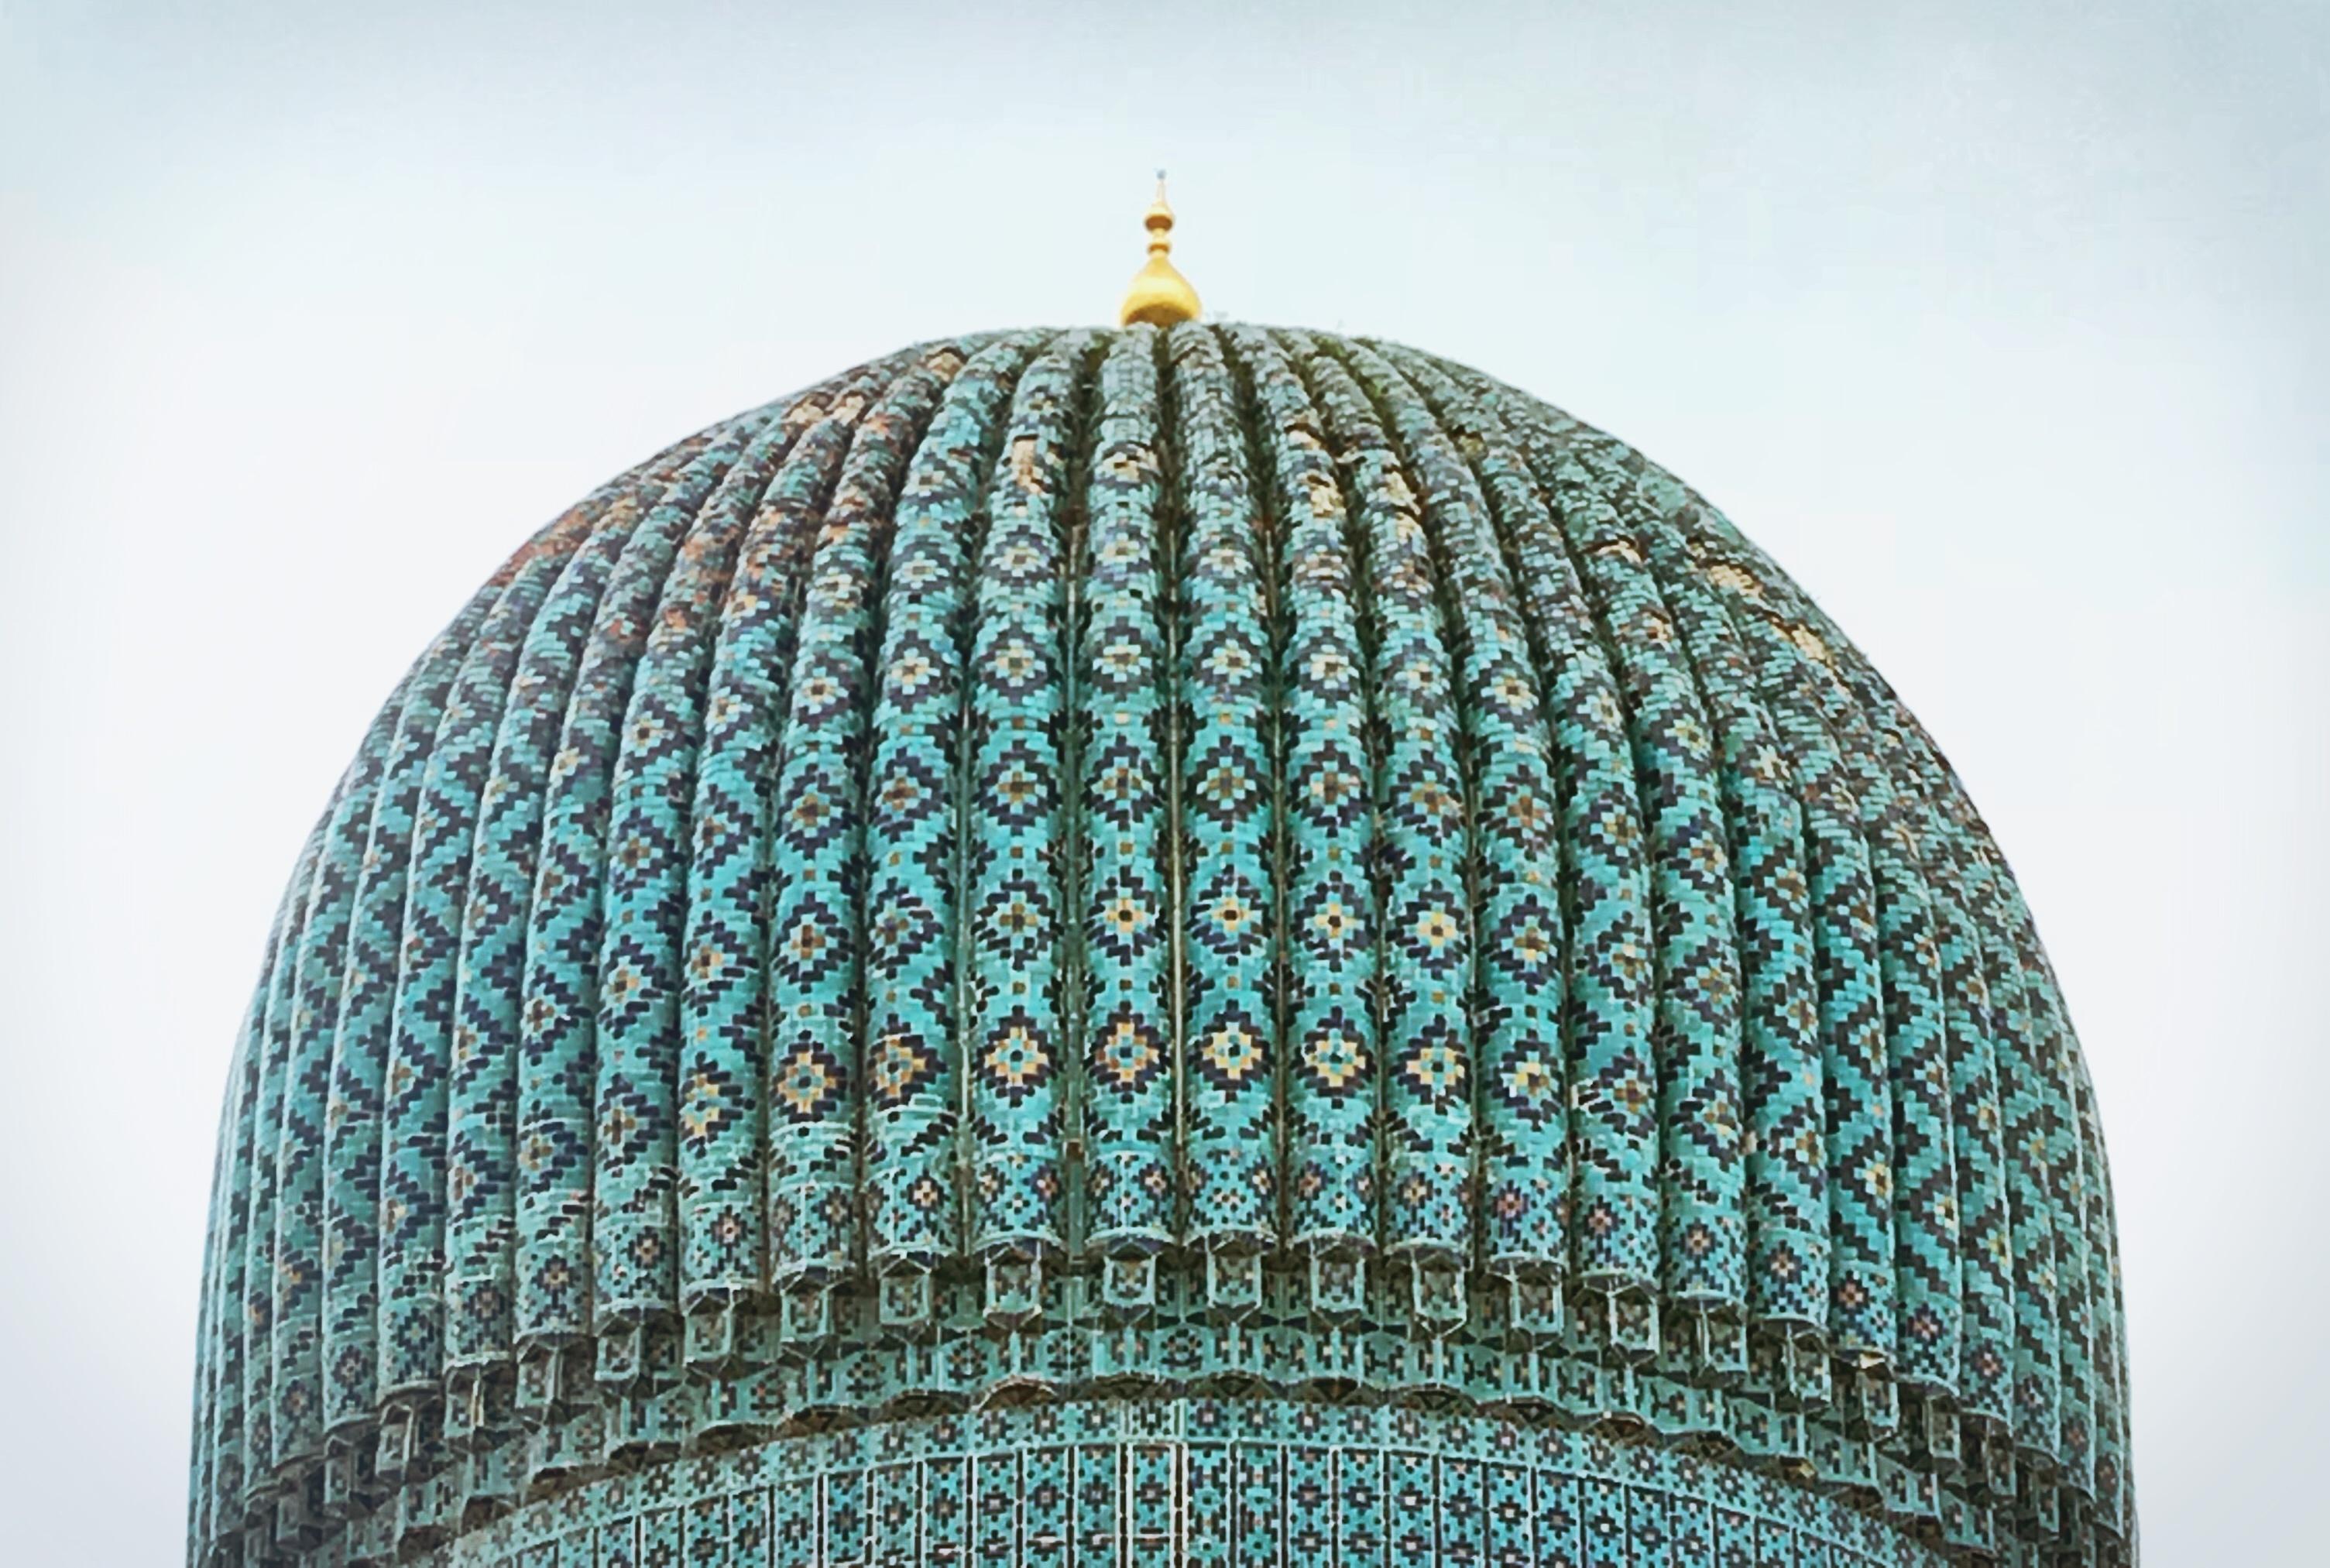 Usbekistan kscheib Samarkand Bibi-Chanum-Moschee